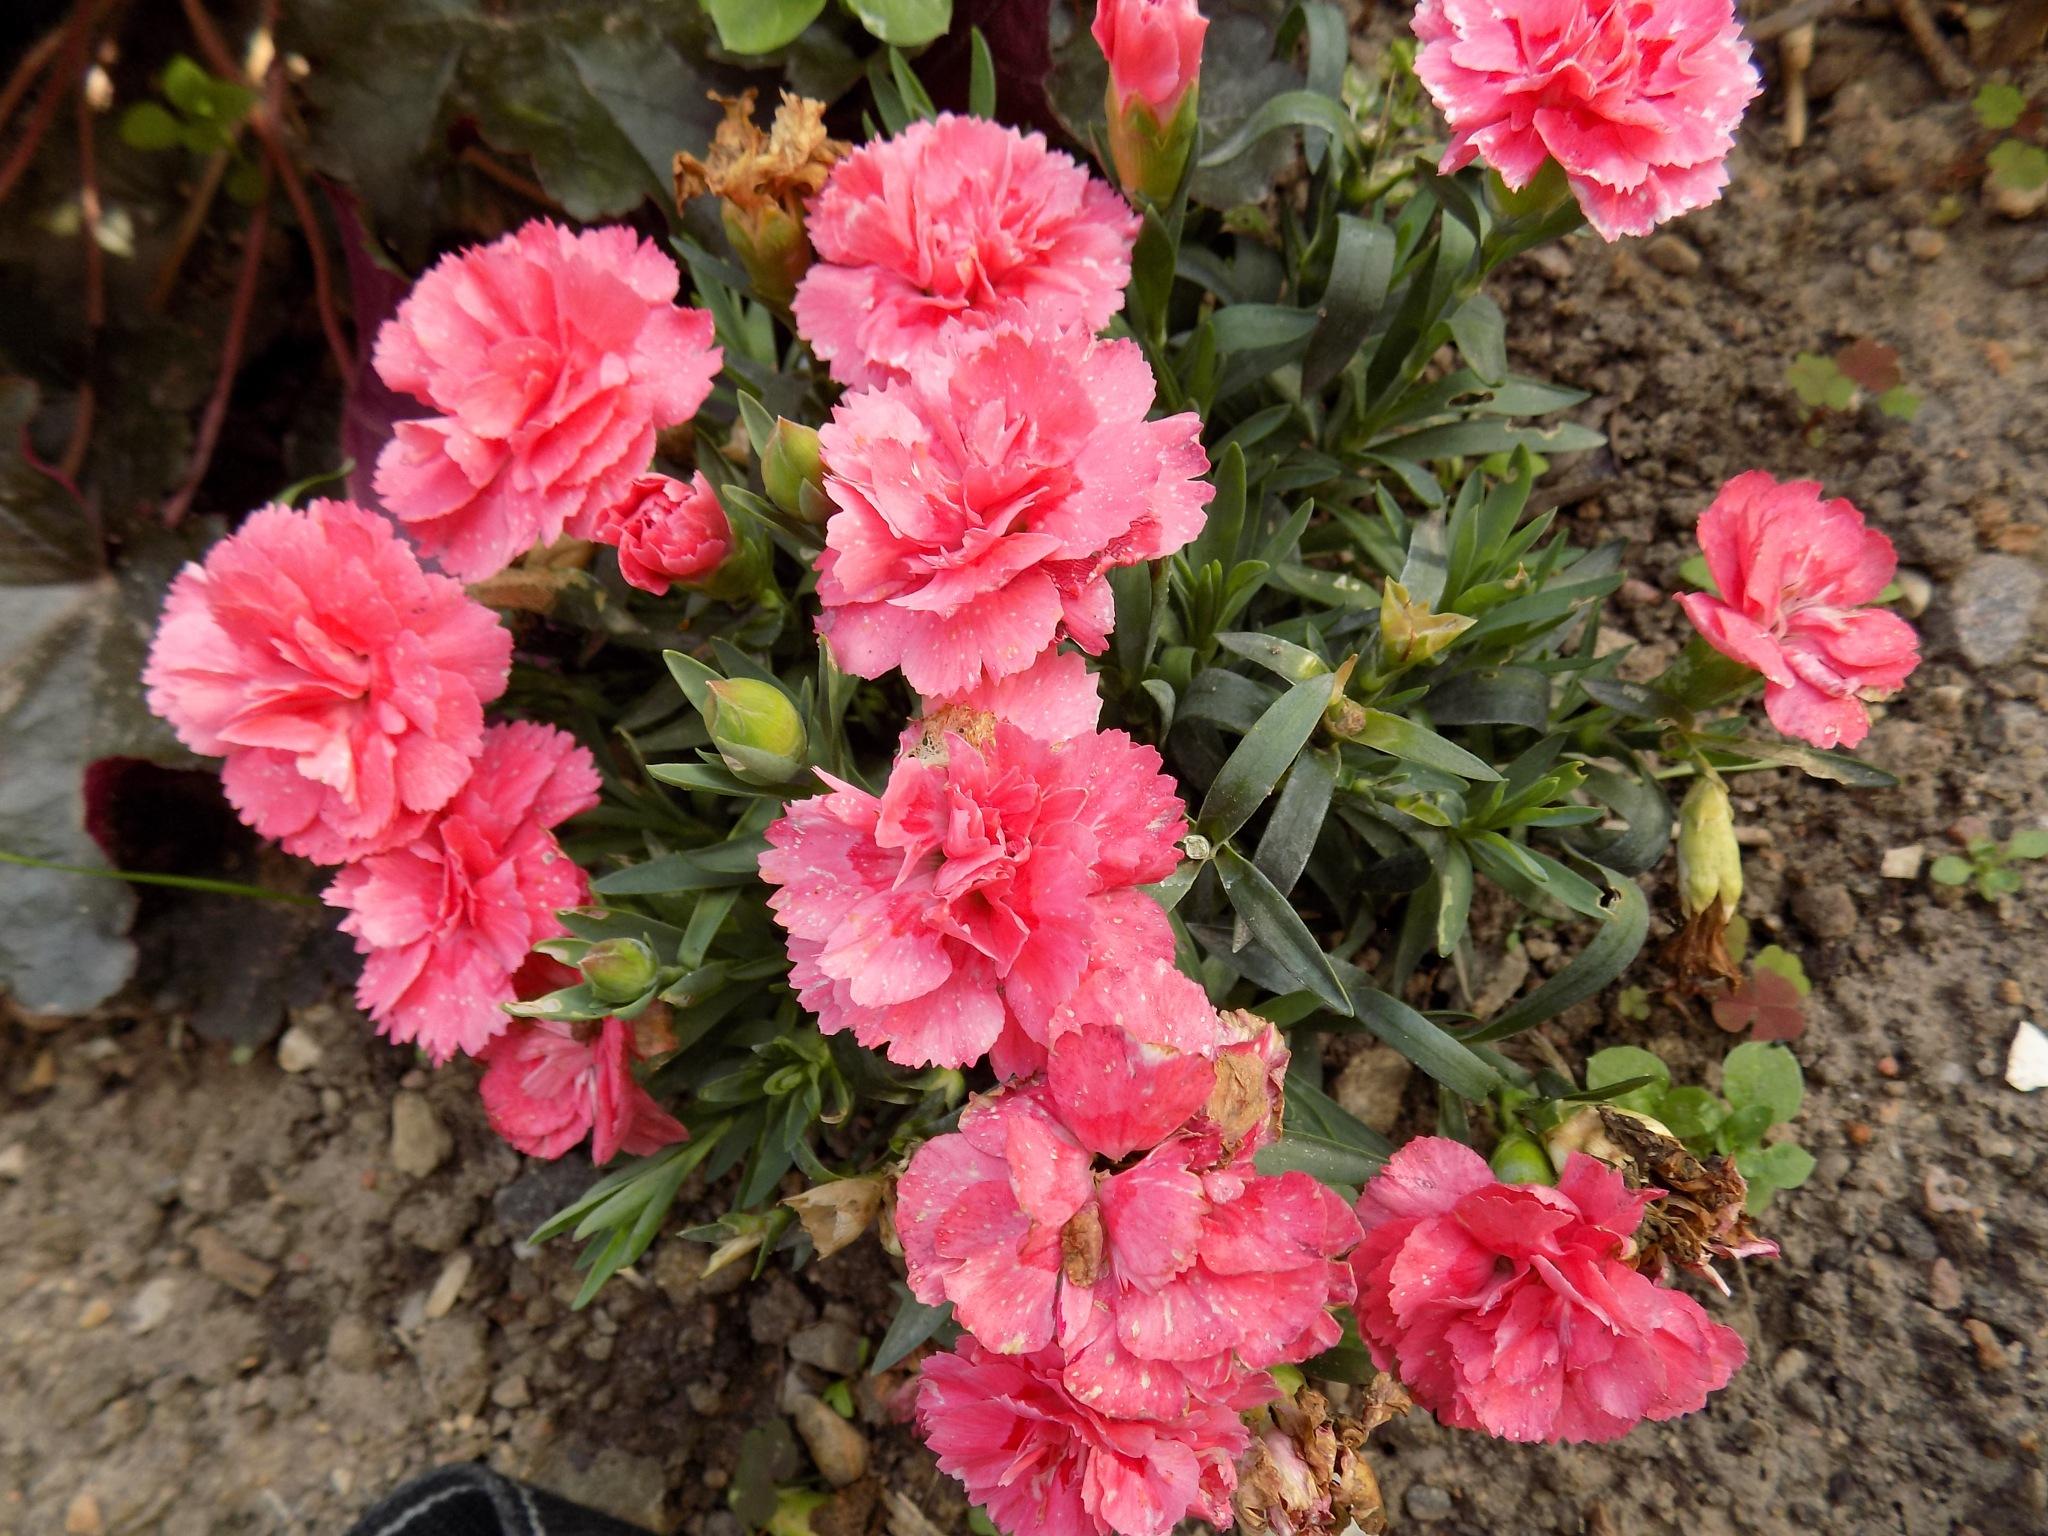 Pink flowers by uzkuraitiene62